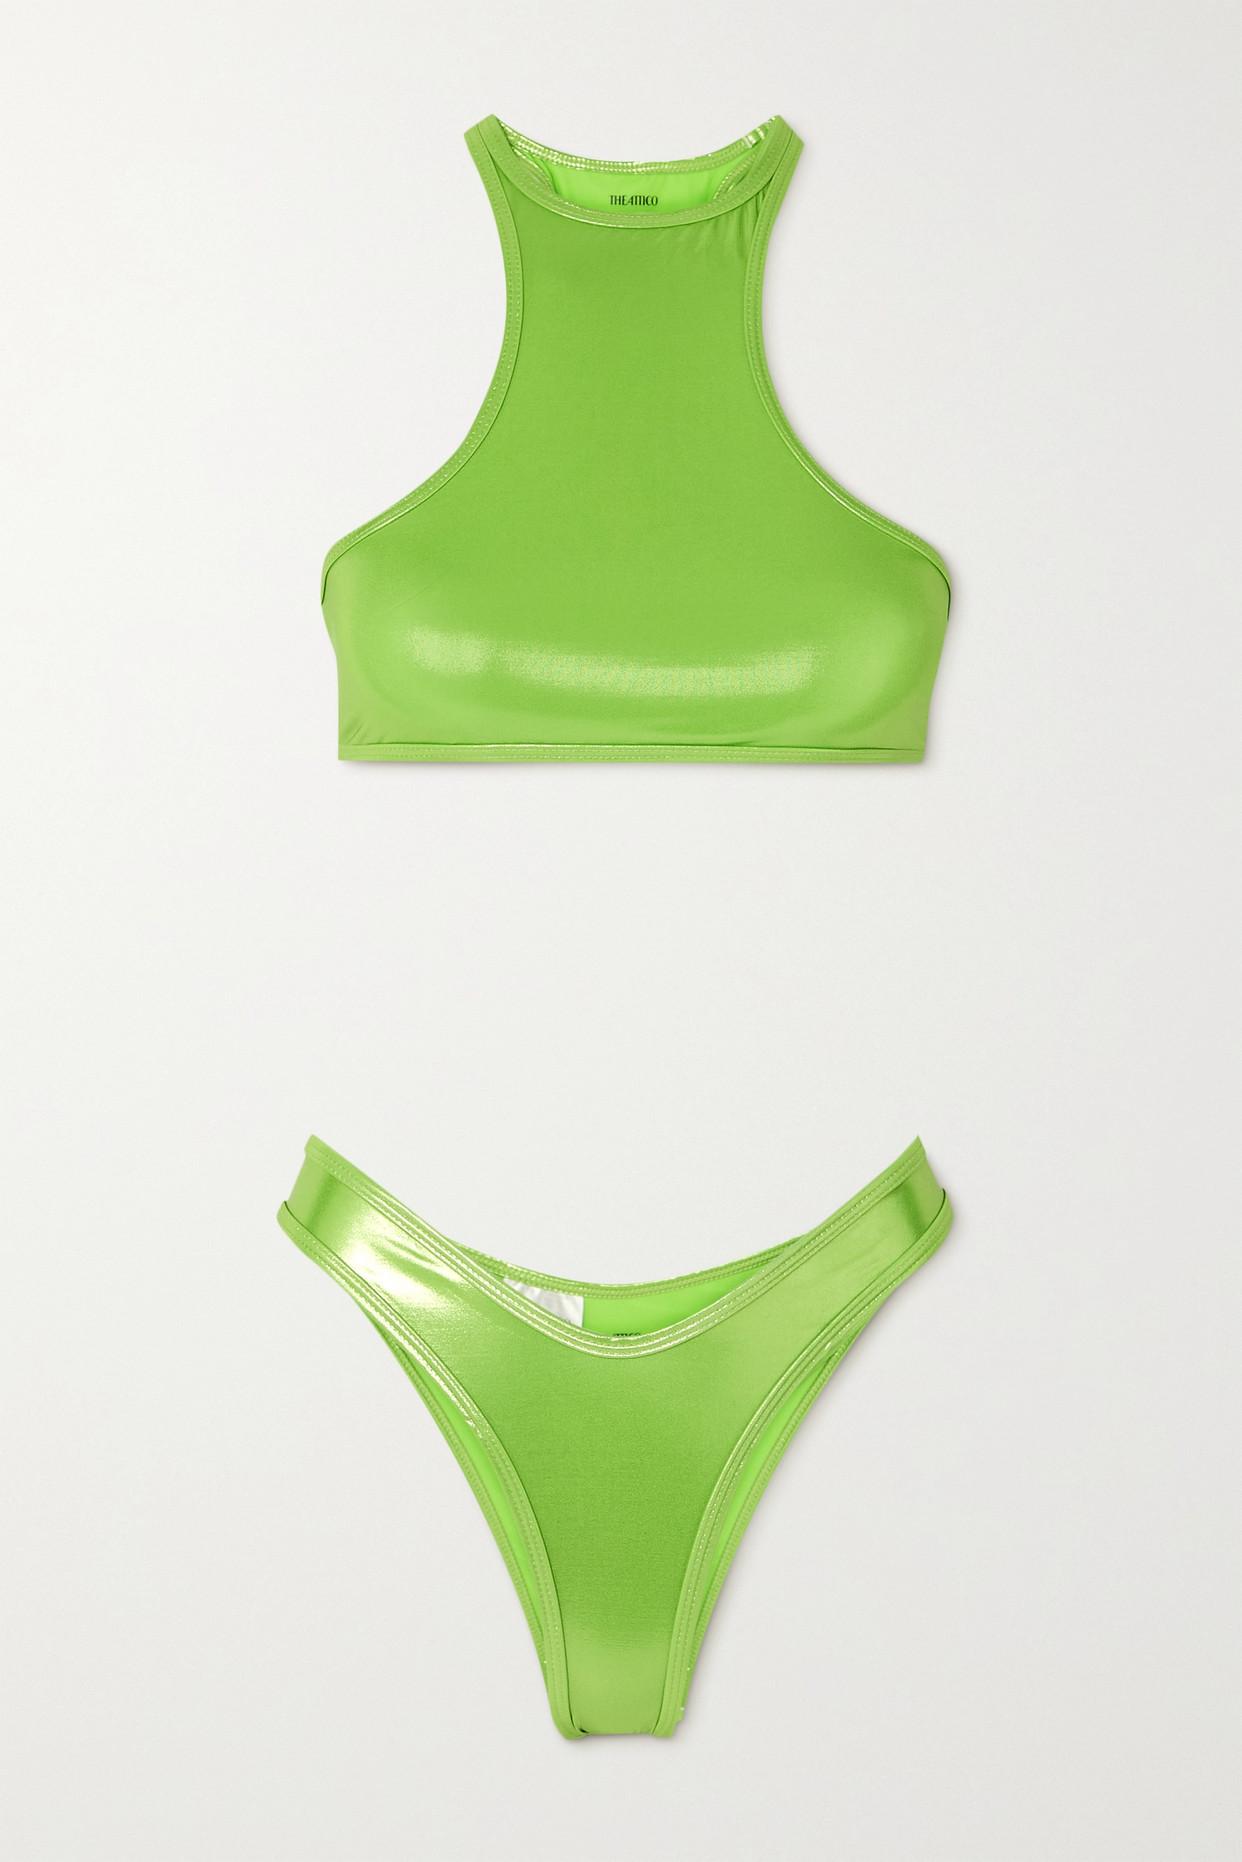 THE ATTICO - Metallic Bikini - Green - x small